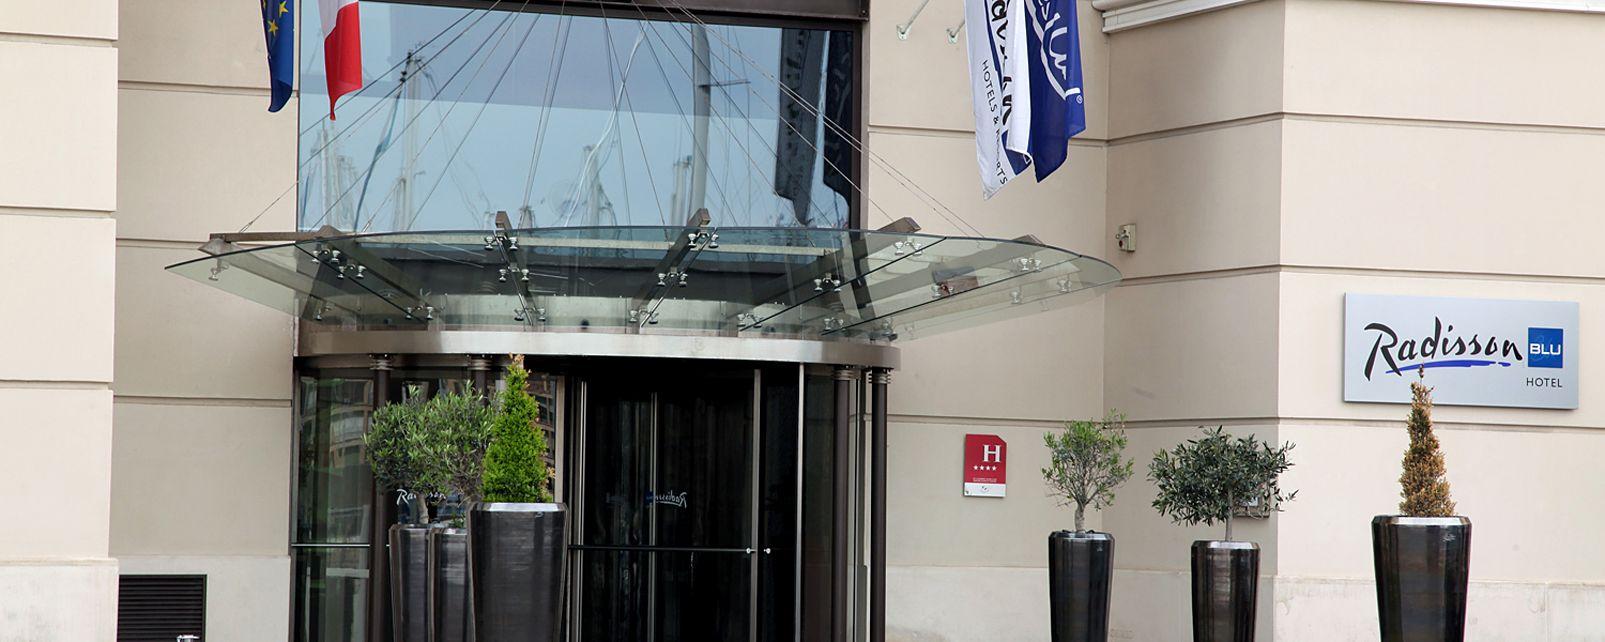 Hôtel Radisson Blu Hotel